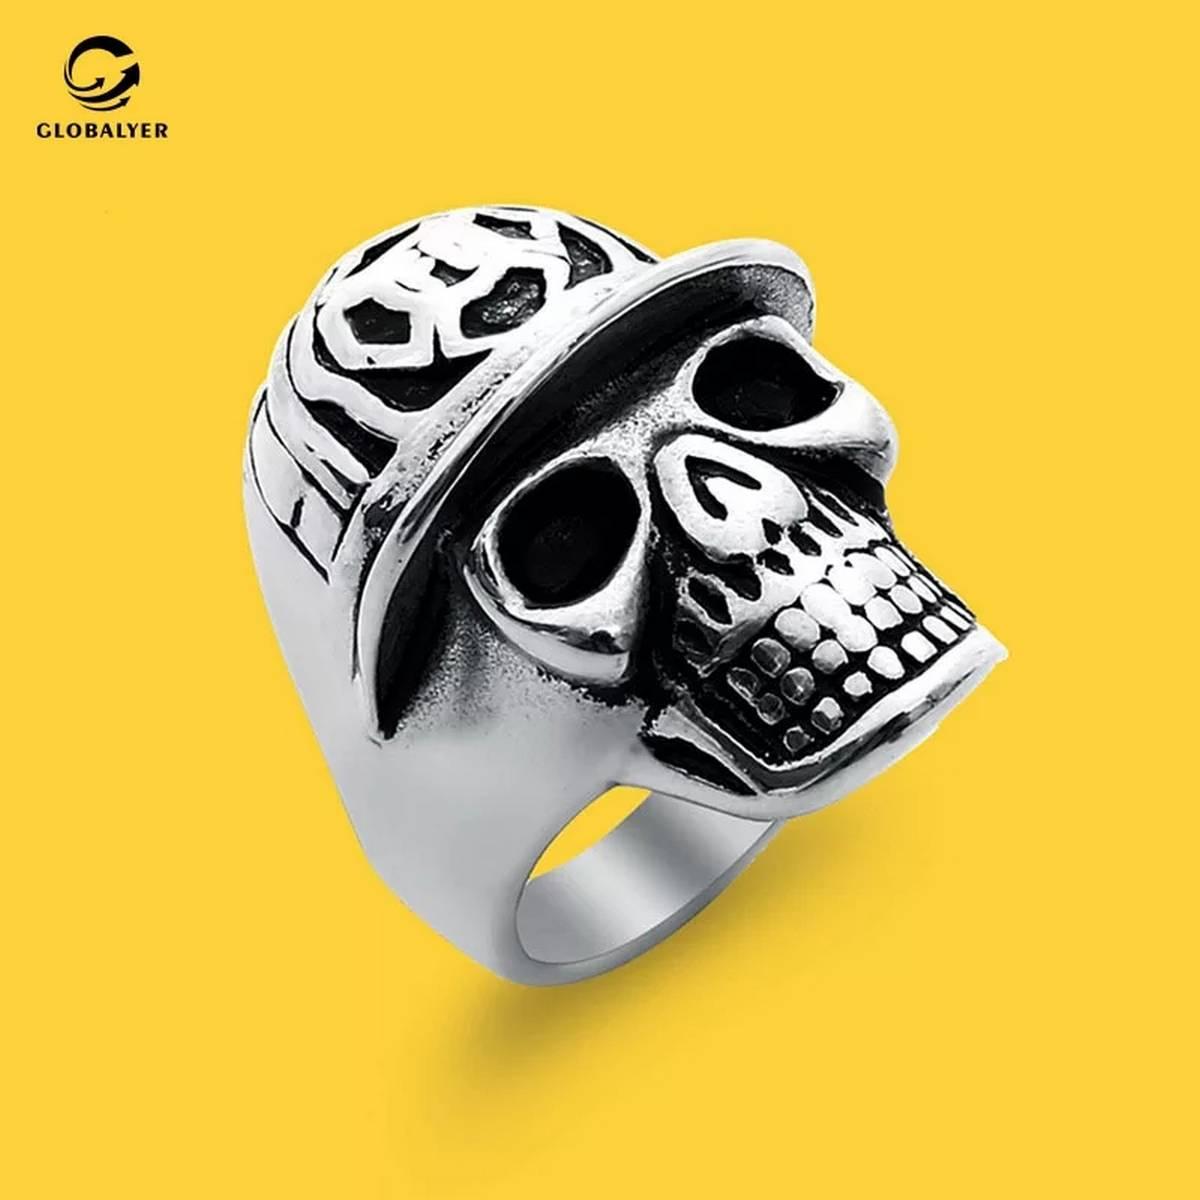 Hot Sale Vintage Style Stainless Steel Devil Talon Skeleton Skull Biker Punk Gothic Fashion Jewelry for Man Fashion Jewelry